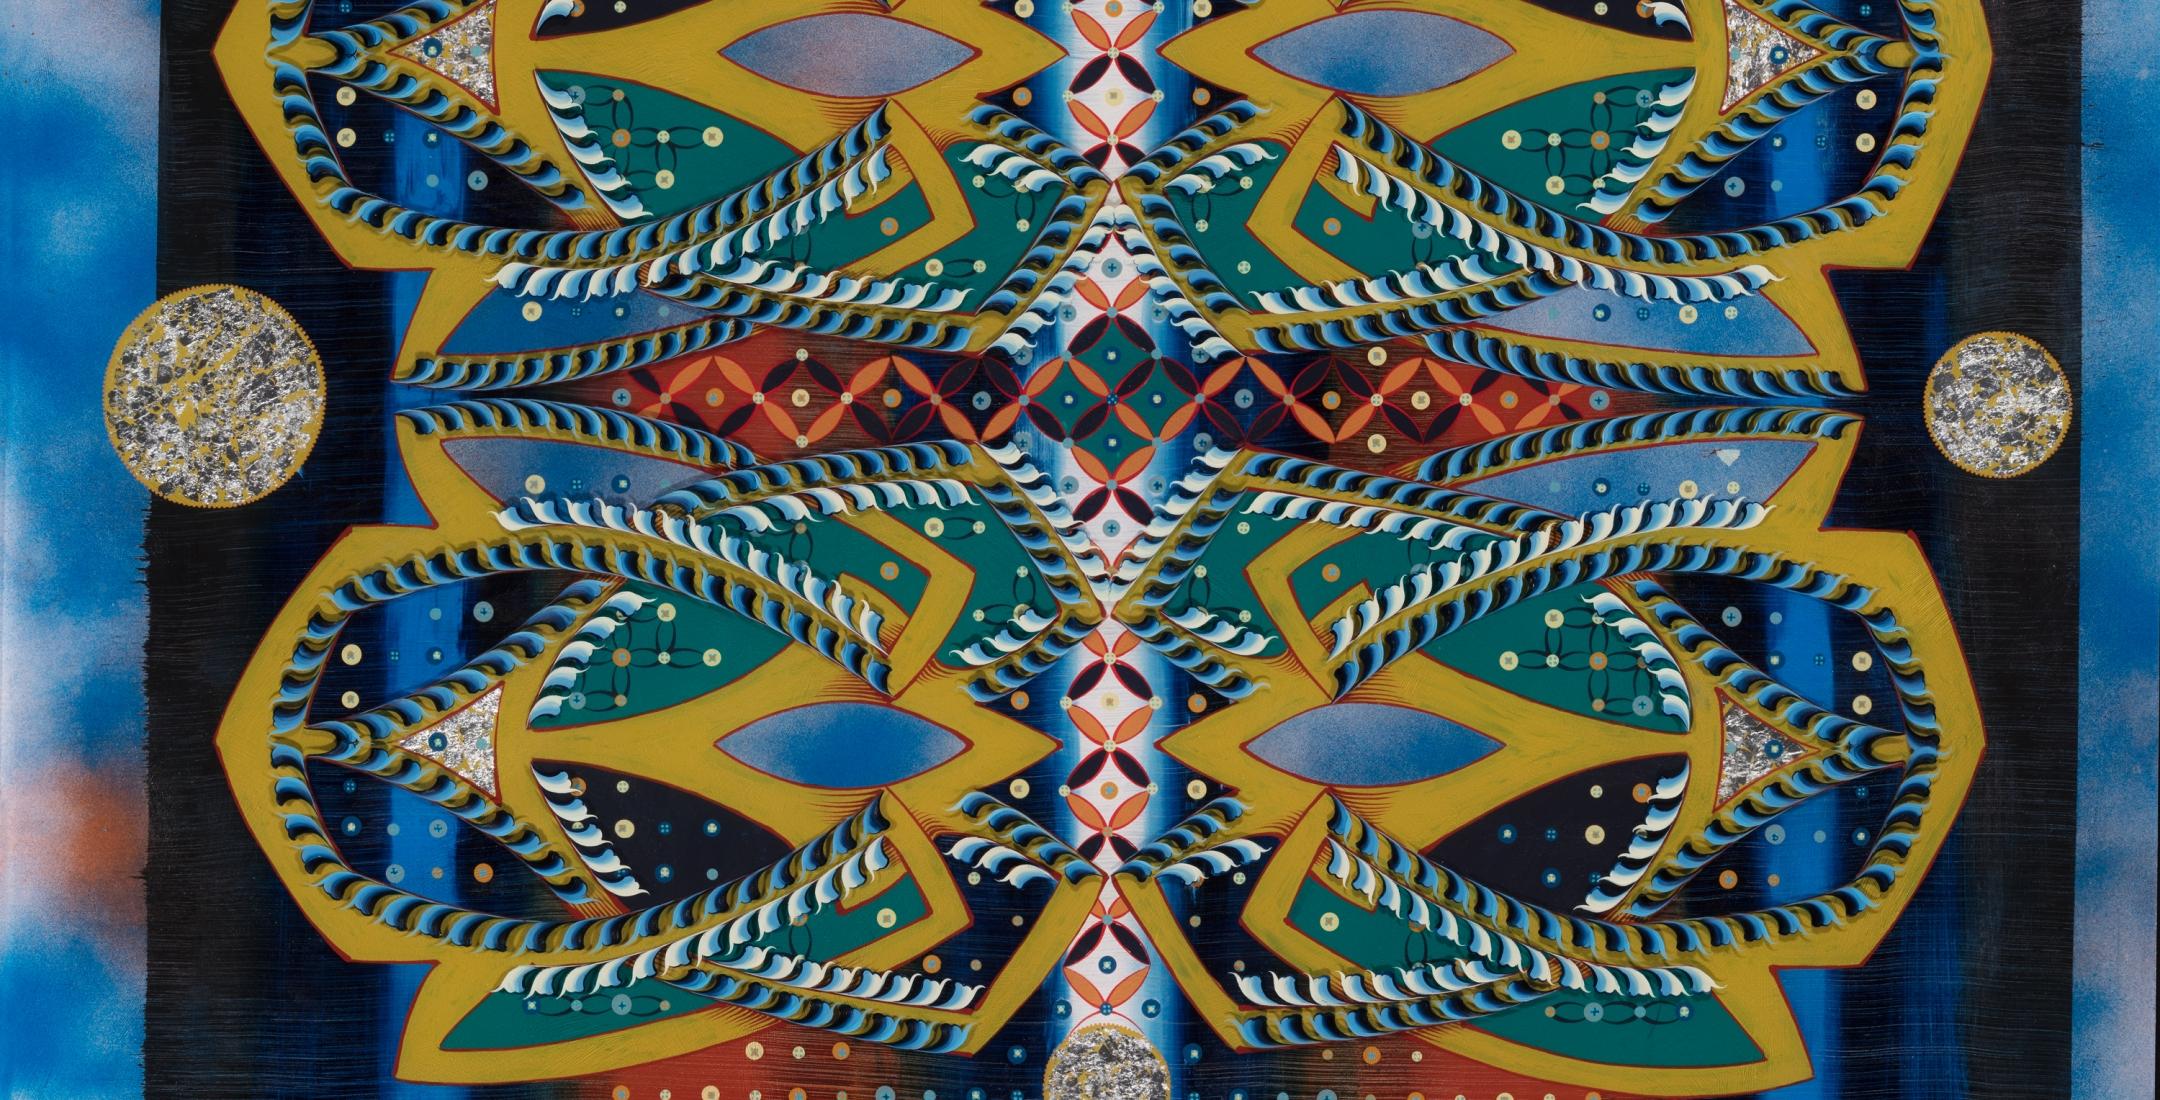 "Tara Austin ""Marquee"", oil, acrylic and silverleaf on plexiglass, 48"" x 48"", 2020, part of Boreal Ornament III through May 30"